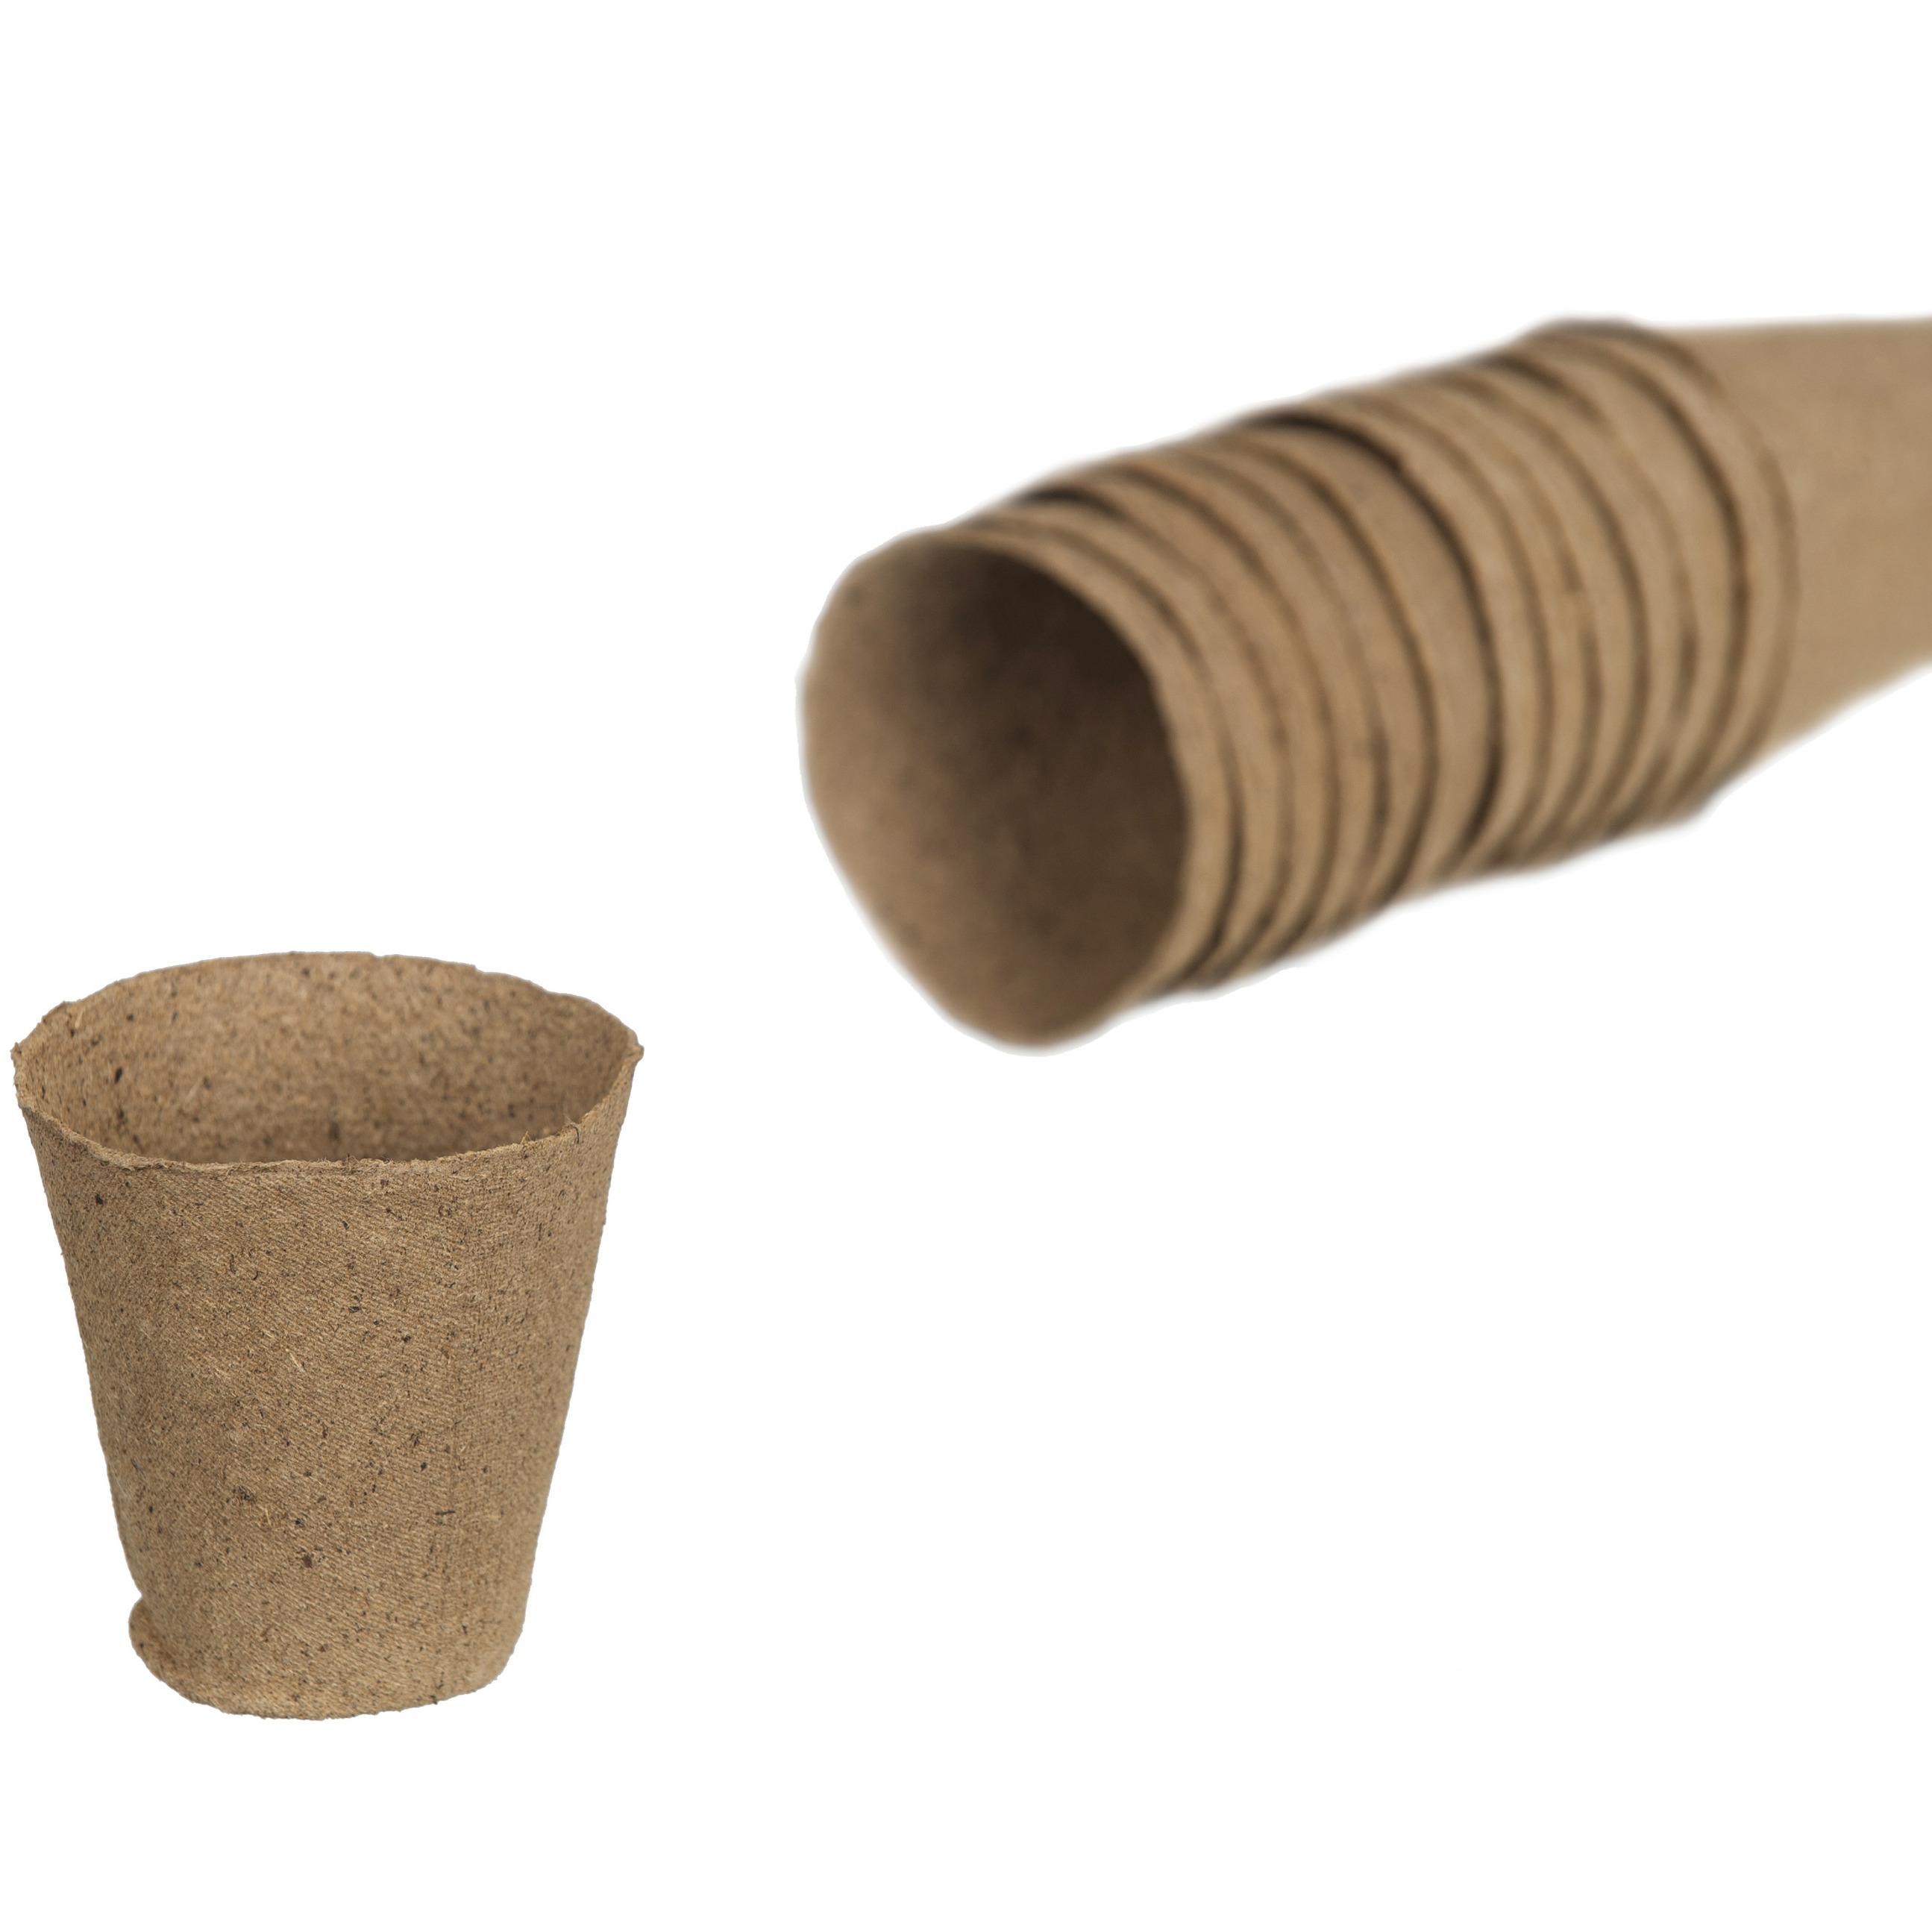 18x stuks biologisch afbreekbare stekpotje / kweekpot 6 cm -